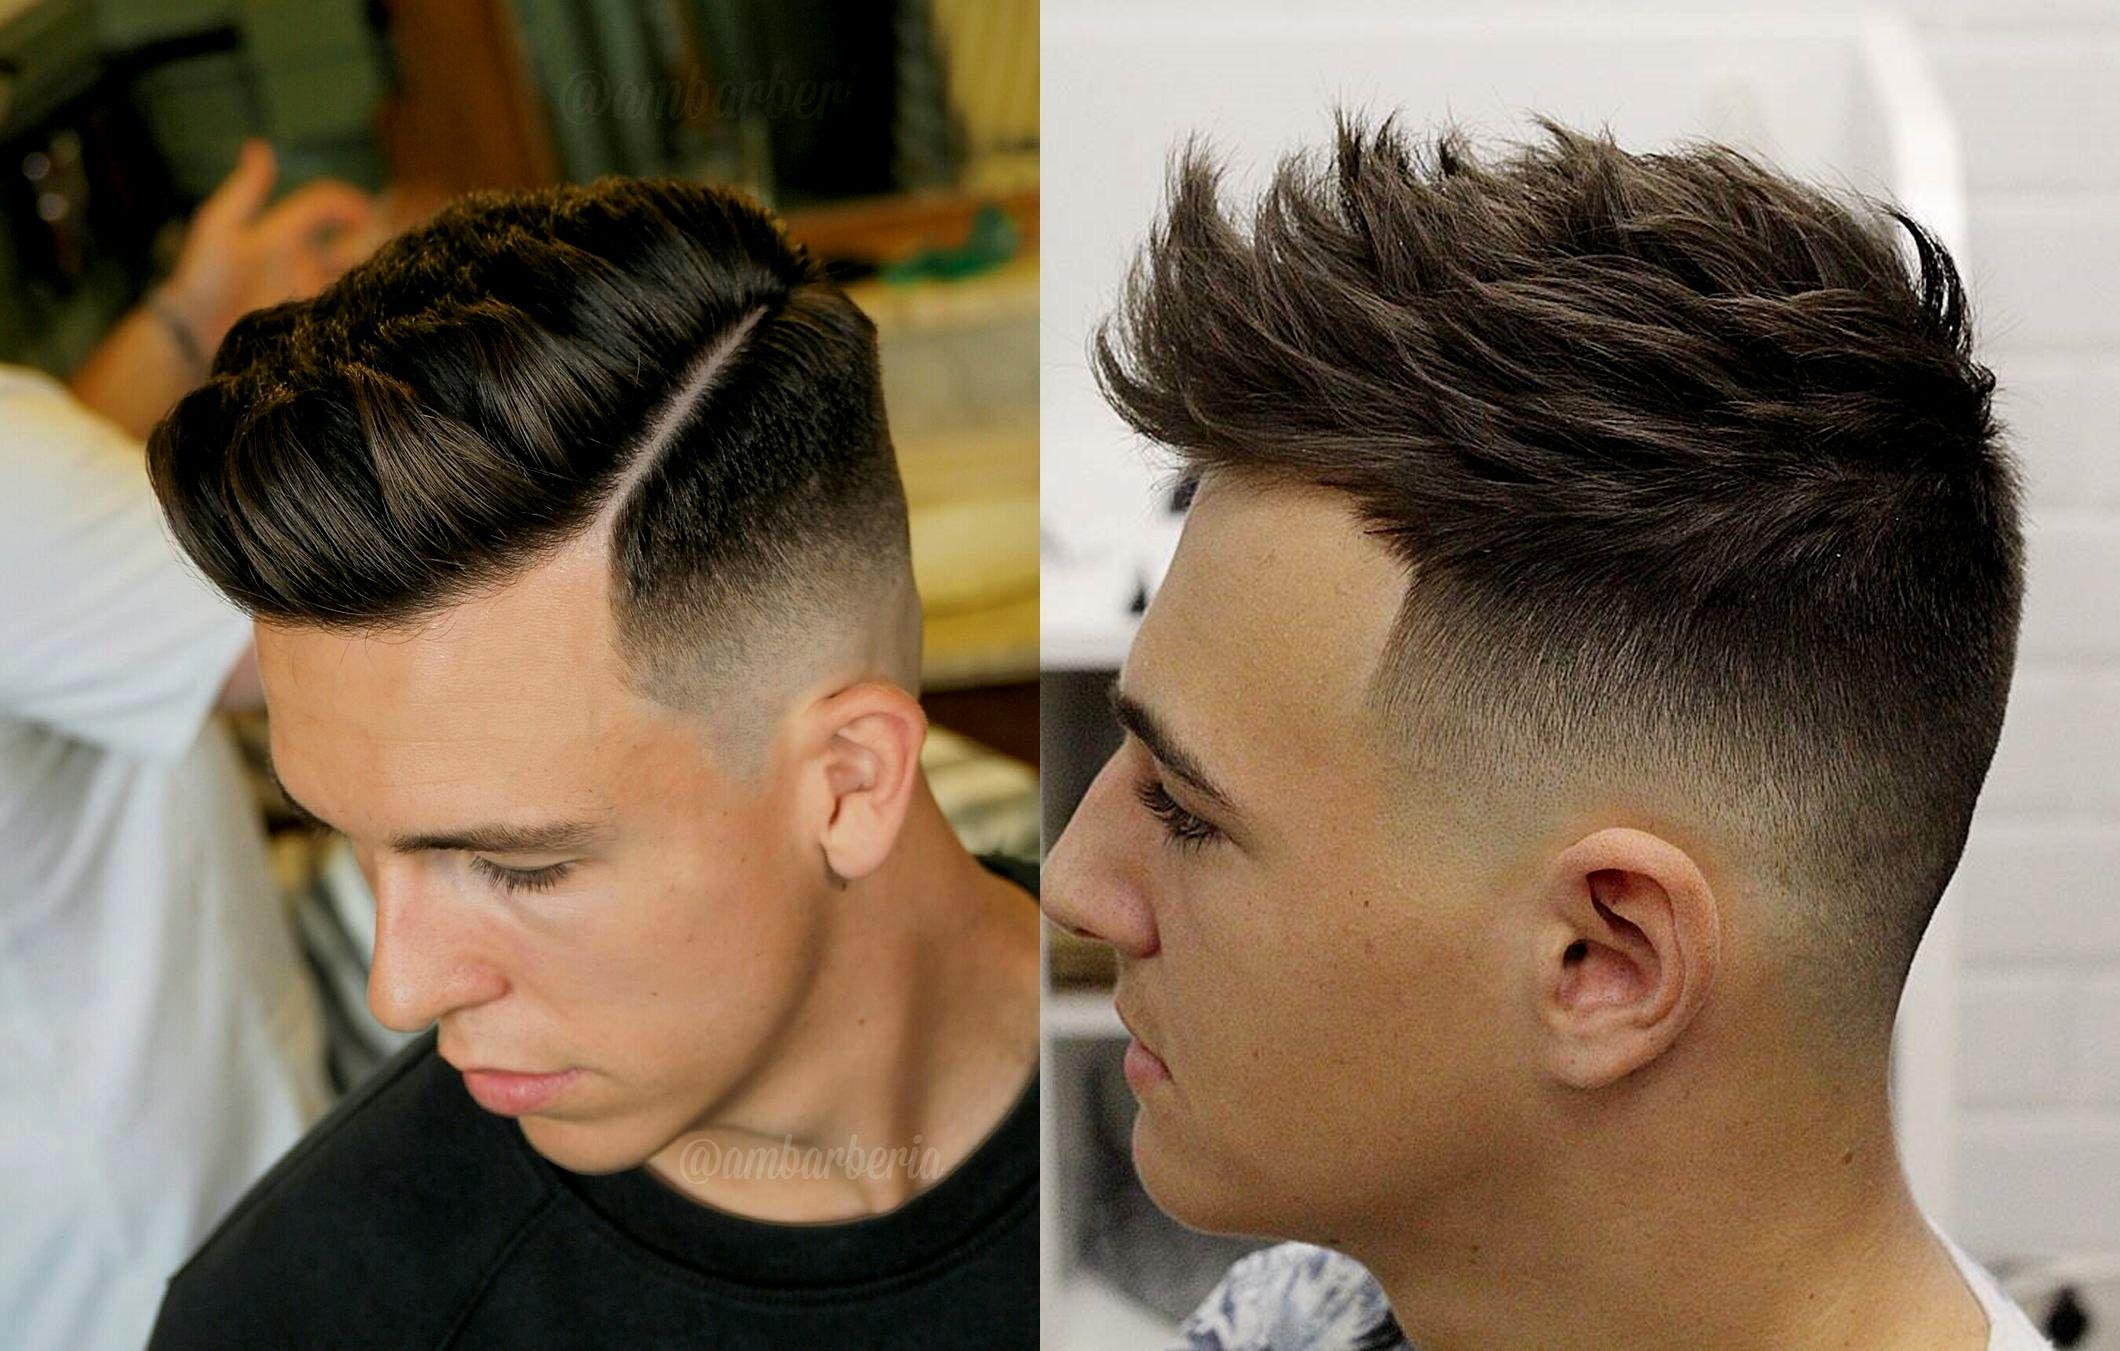 fresh corte de cabelo masculino para o lado imagem-Melhor Best Of Corte De Cabelo Masculino Para O Lado Plano